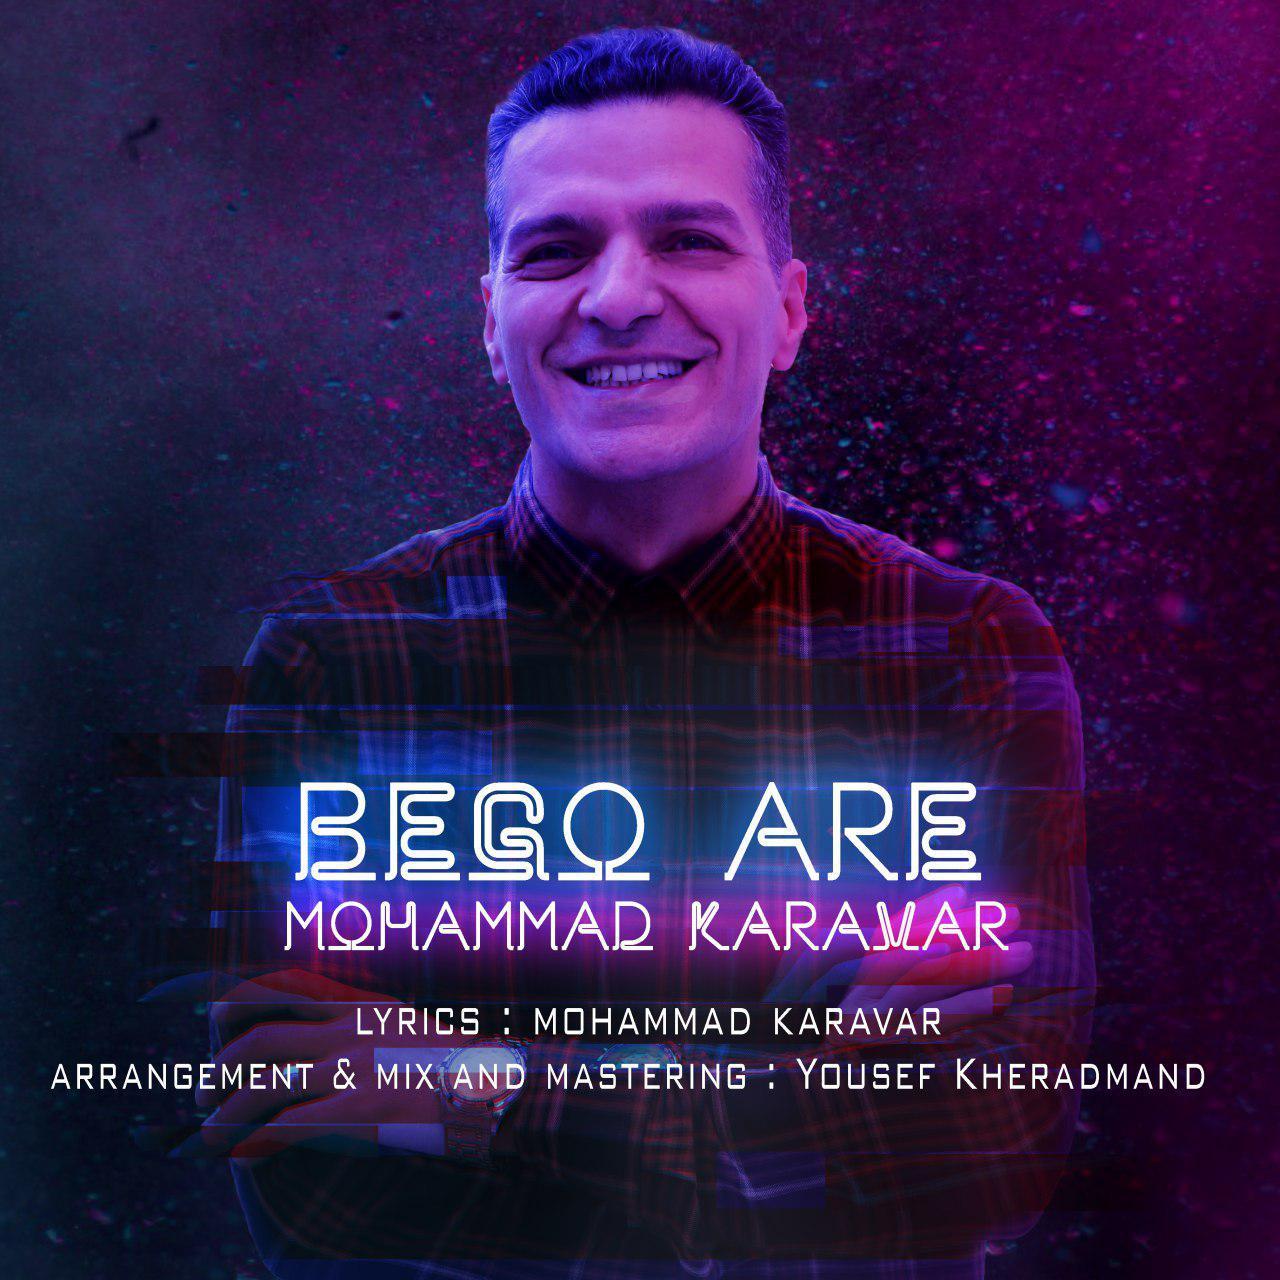 Mohammad Karavar – Bego Are